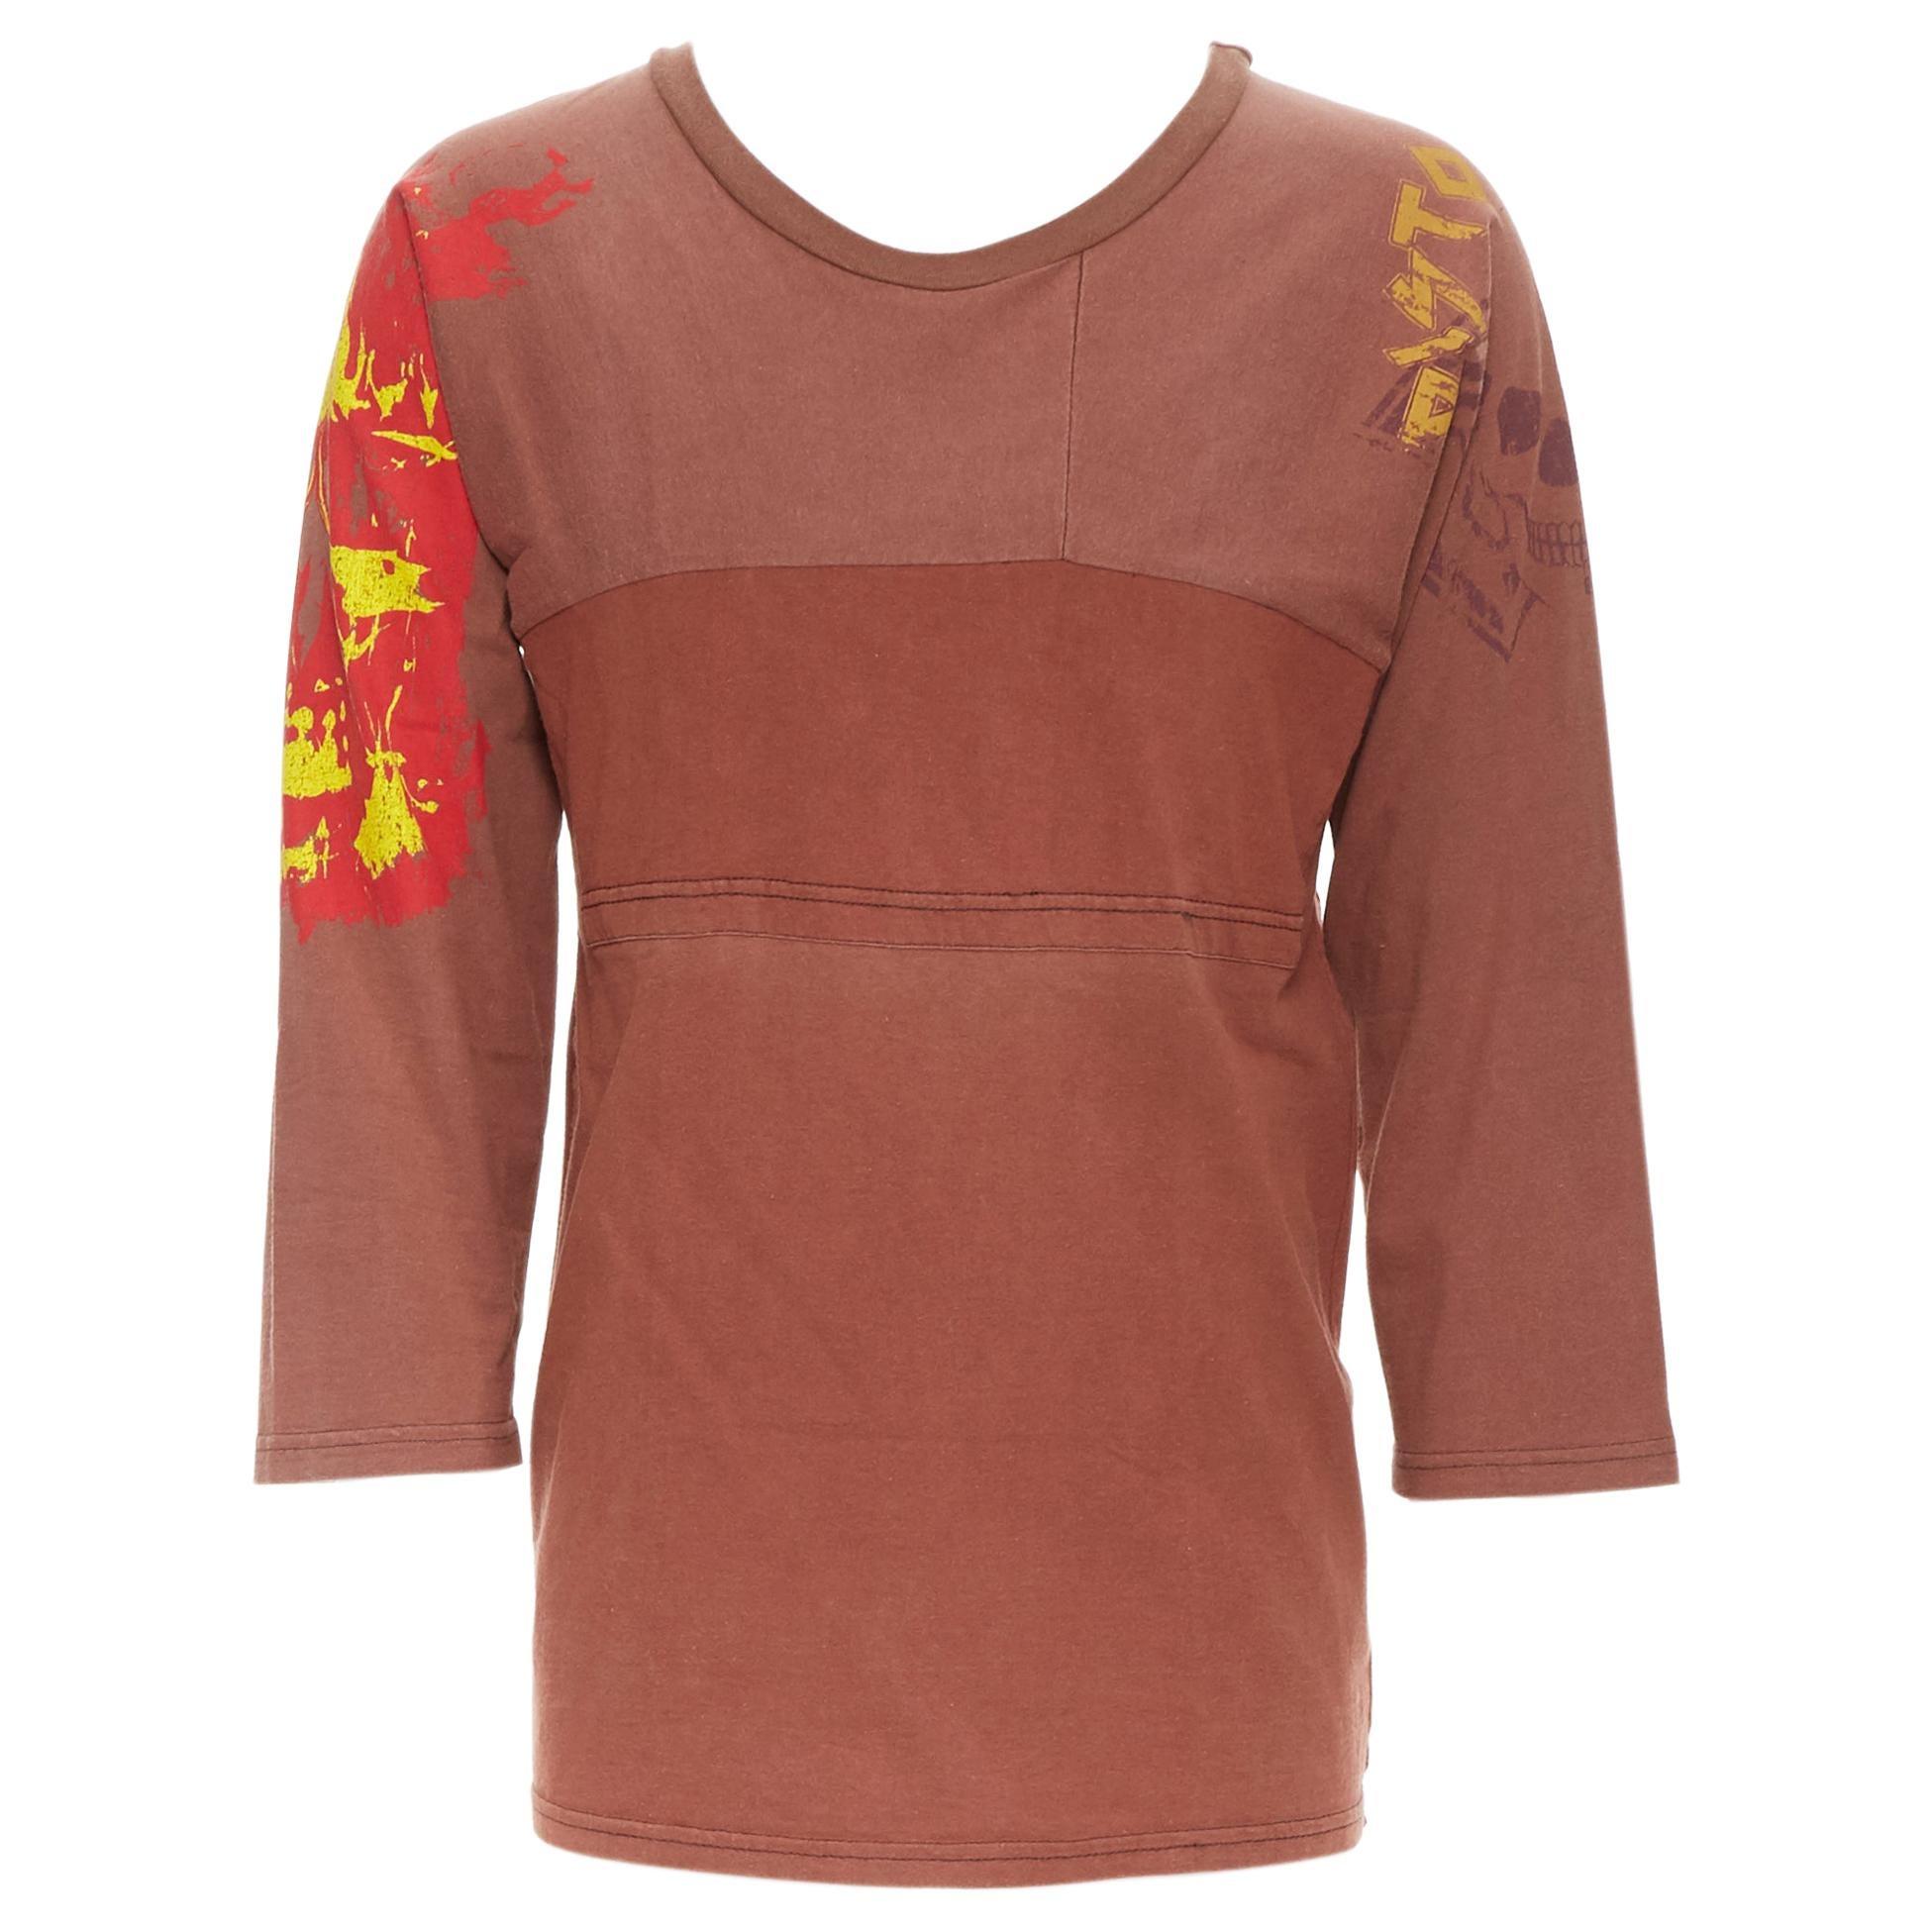 MAISON MARGIELA 2013 brown cotton deconstructed patchwork bank t-shirt top